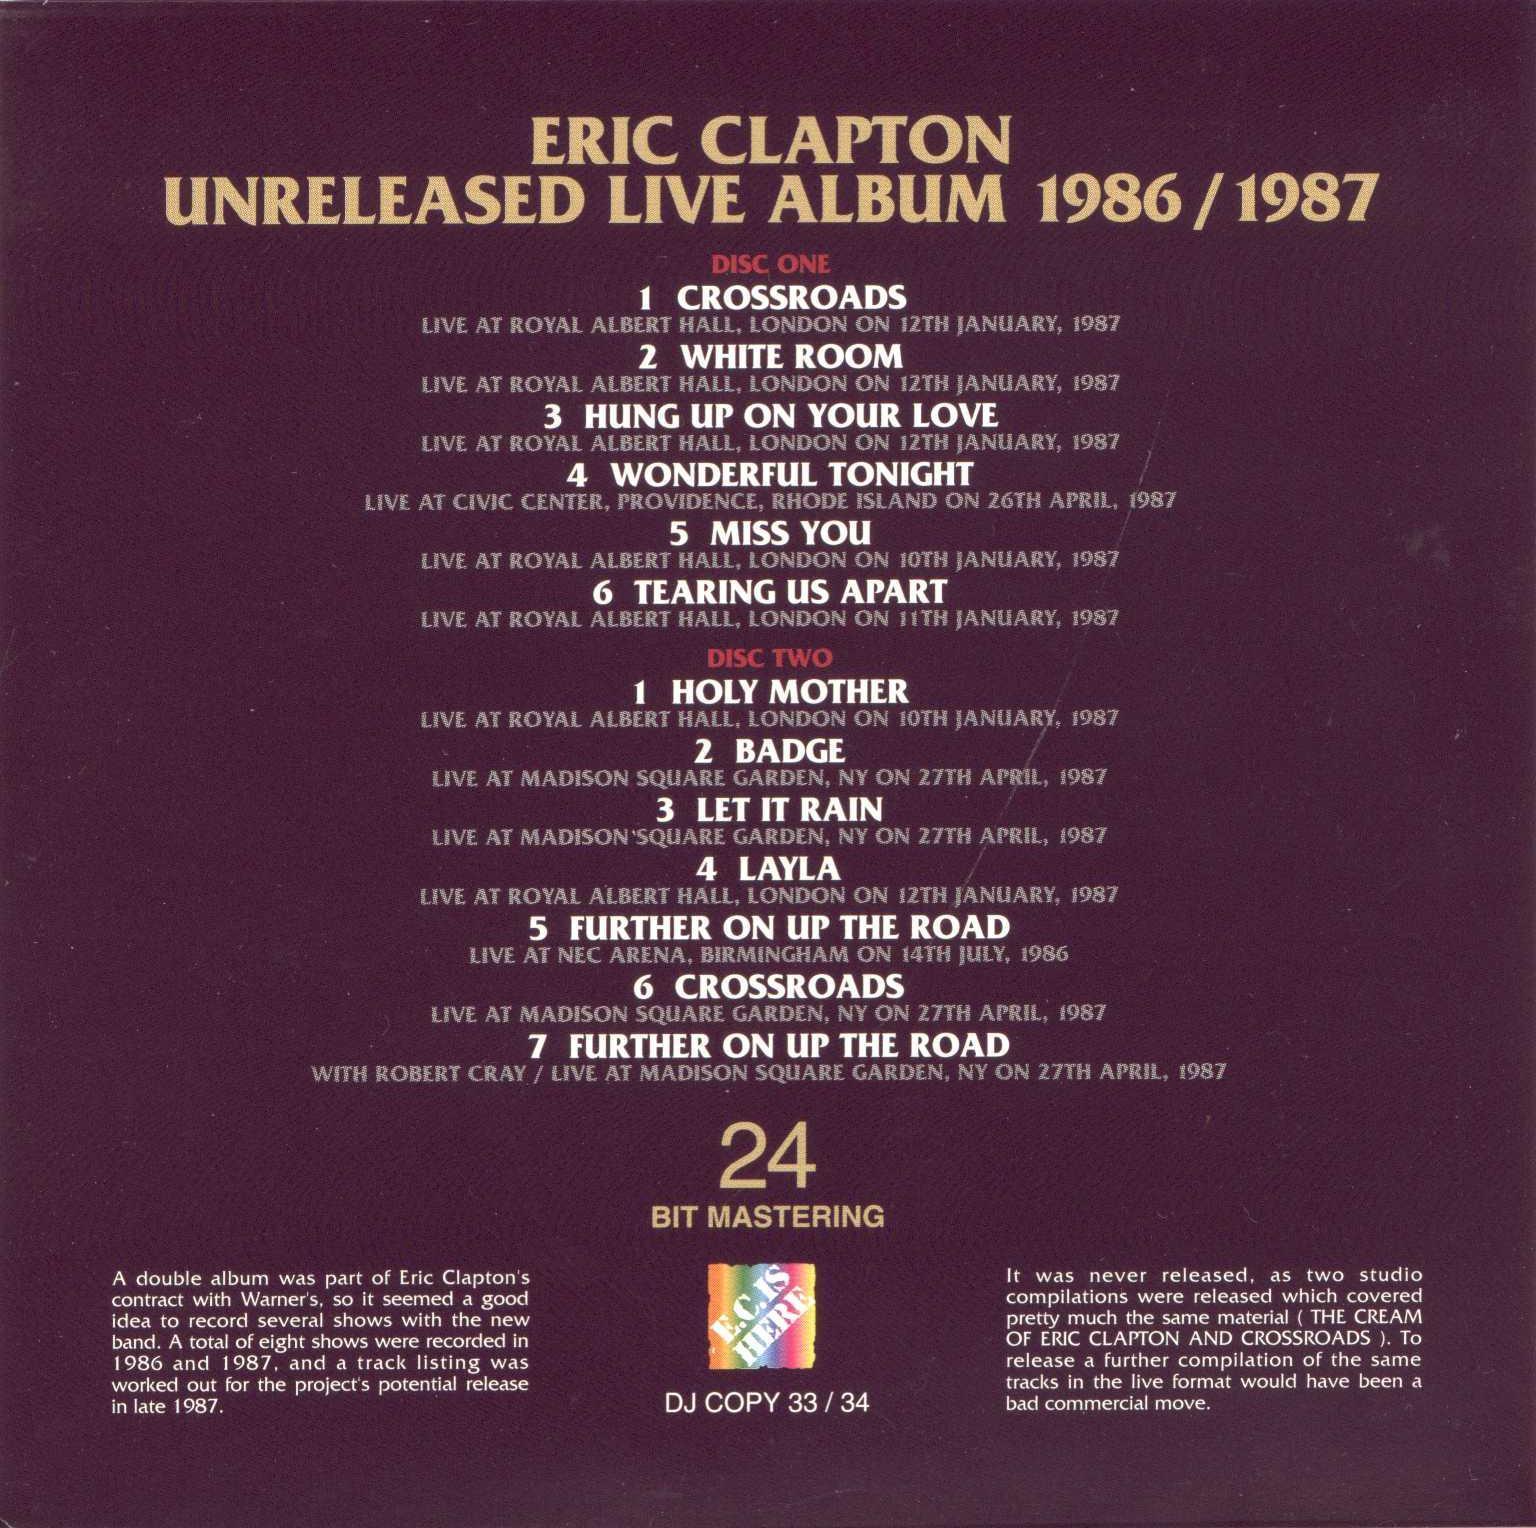 Eric Clapton and The Yardbirds With Sonny Boy Williamson Eric Clapton And The Yardbirds Live With So